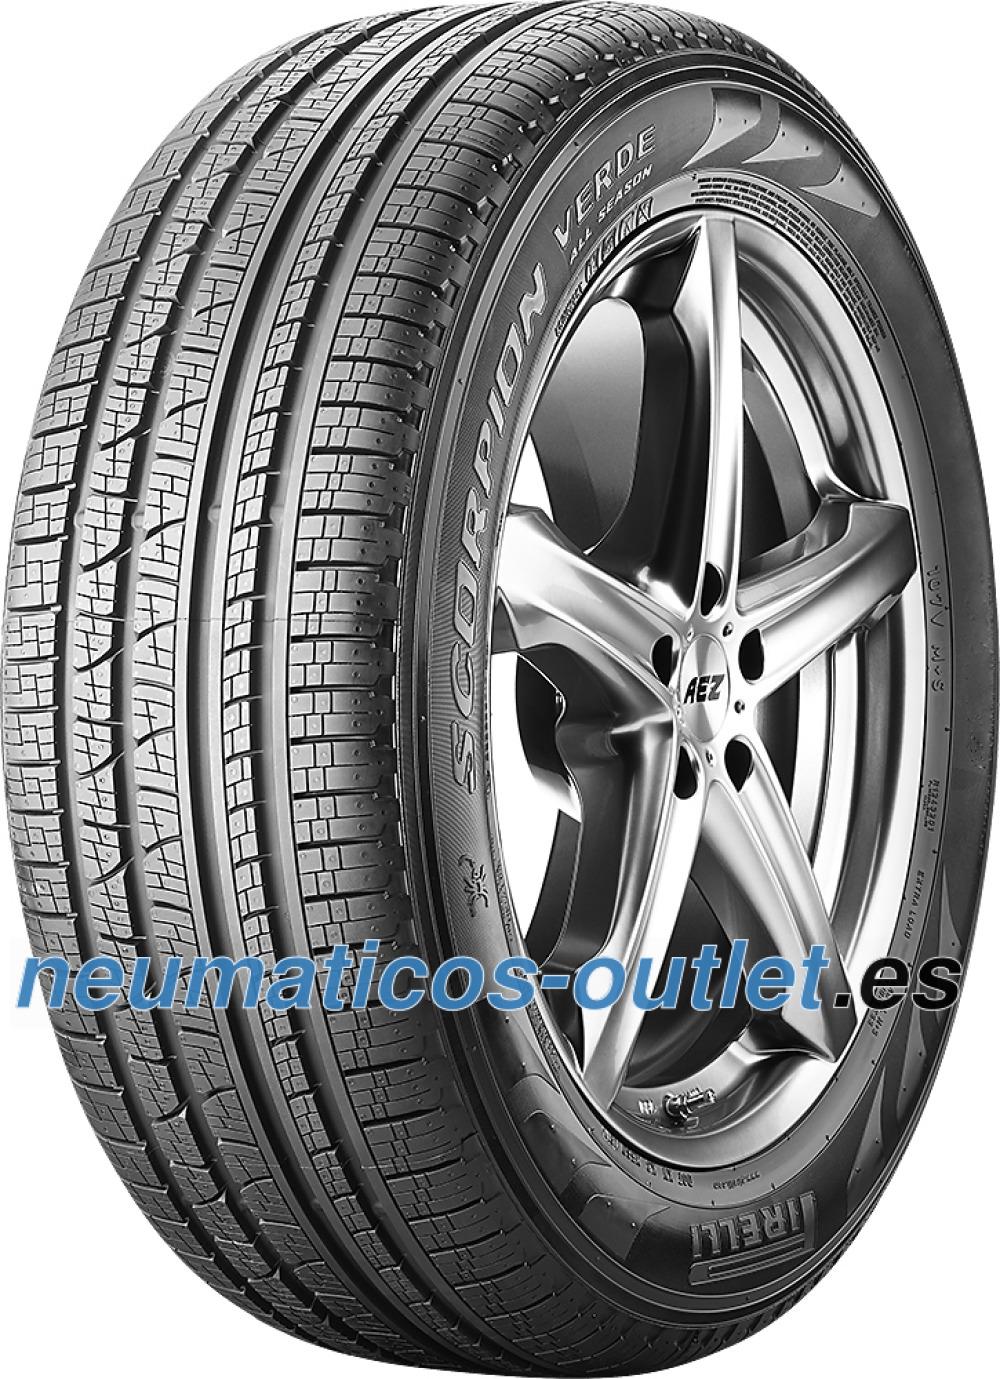 Pirelli Scorpion Verde All-Season ( 245/70 R16 111H XL ECOIMPACT, con protector de llanta (MFS) )